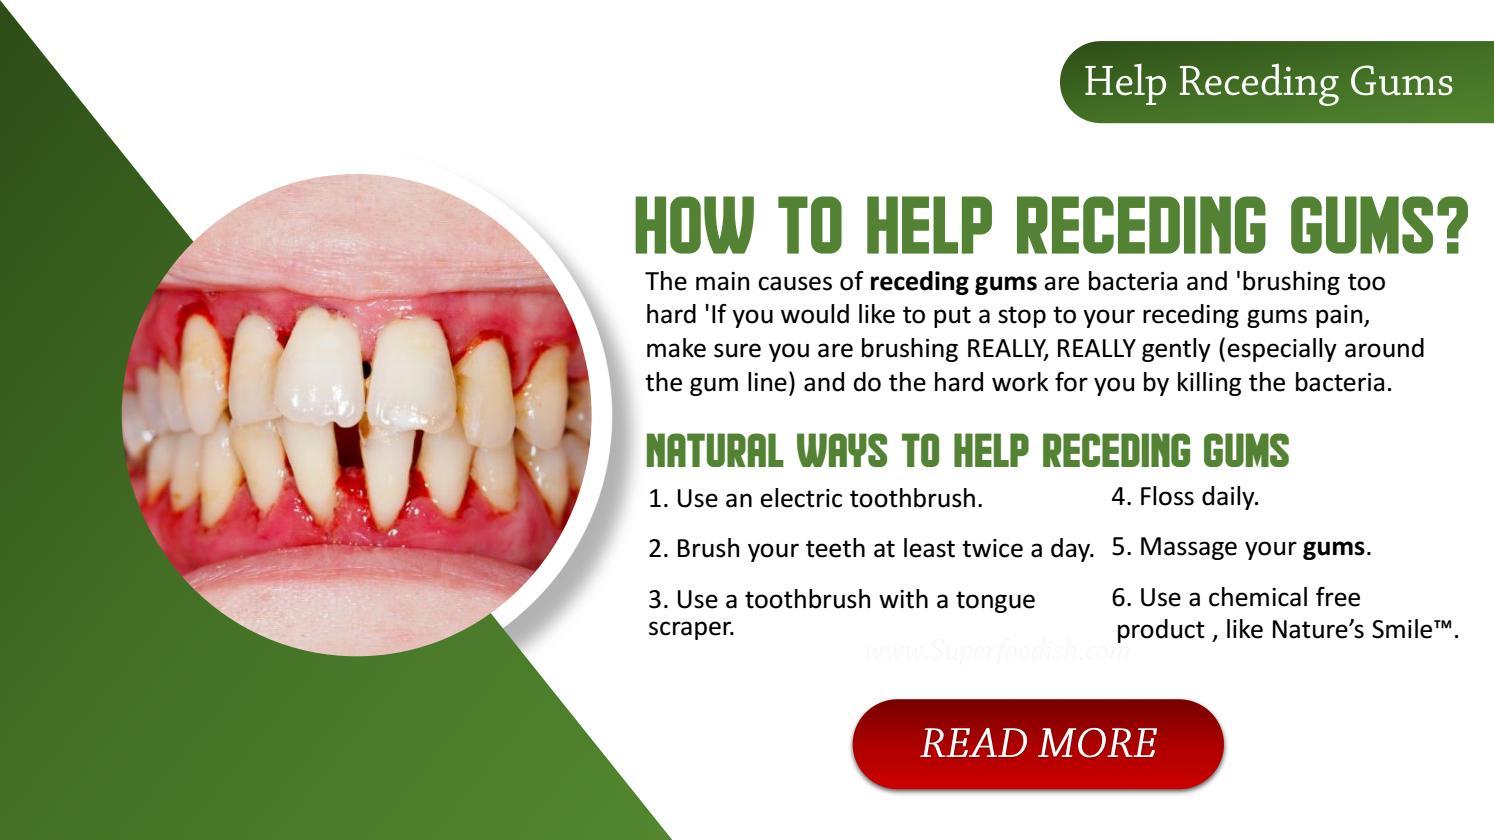 help for receding gums natural